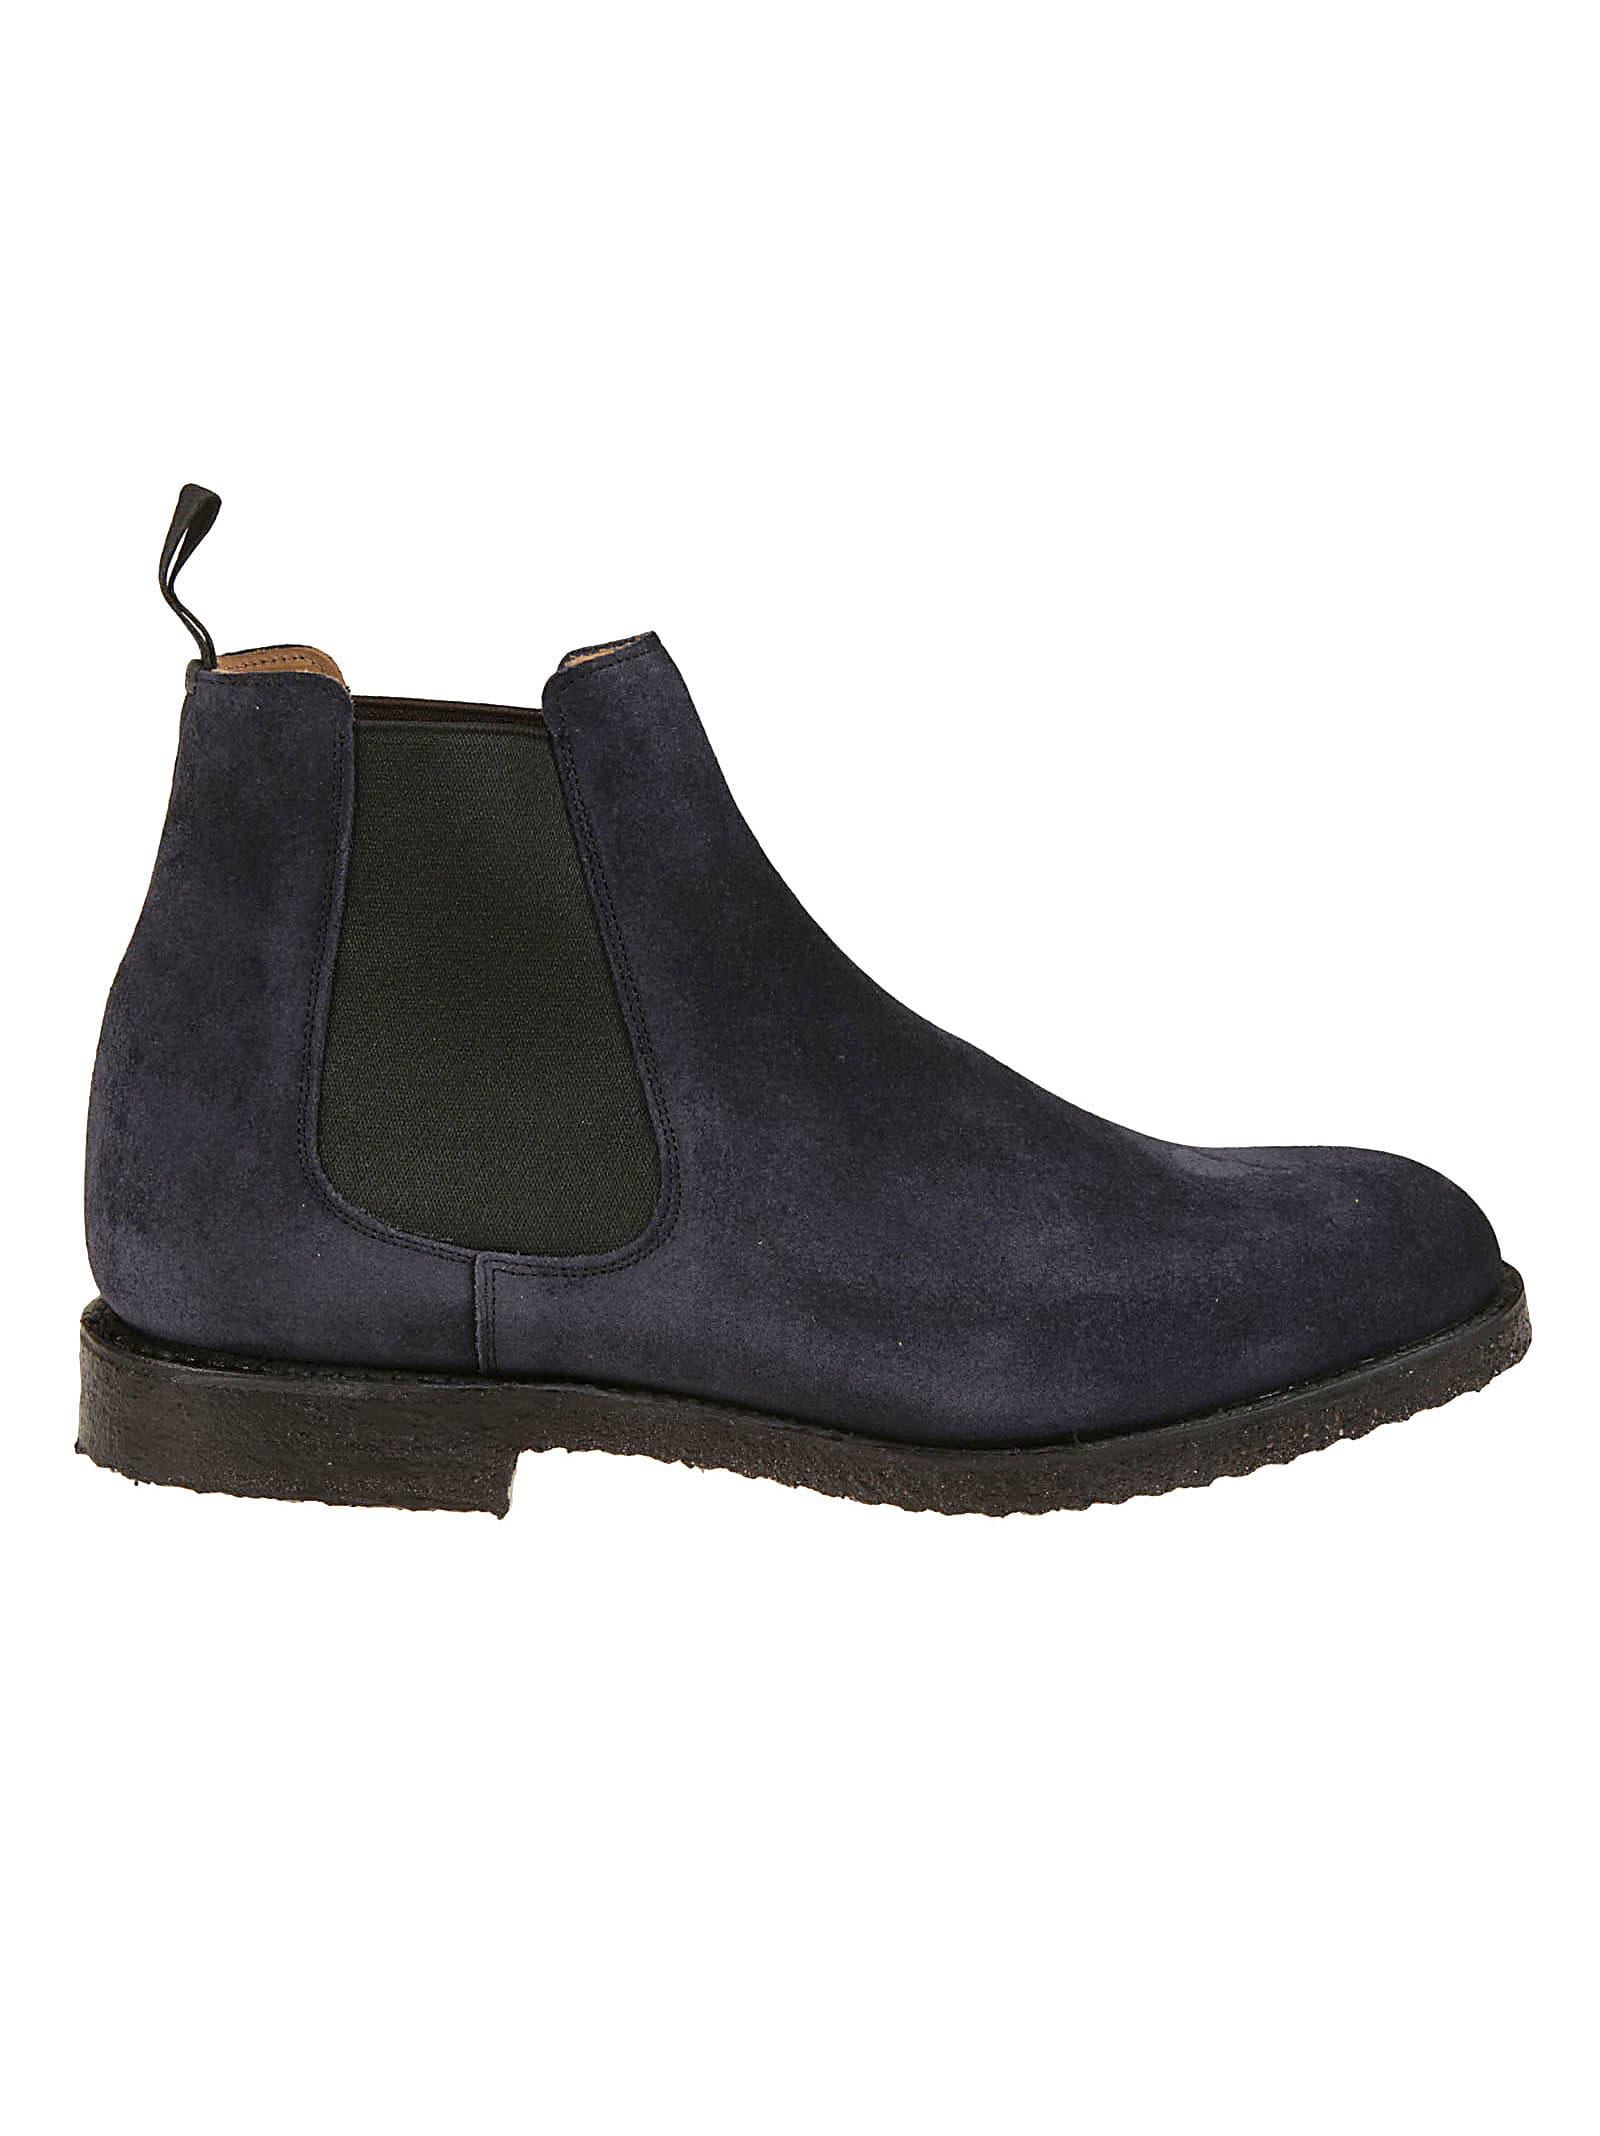 Churchs Greenock Ankle Boots